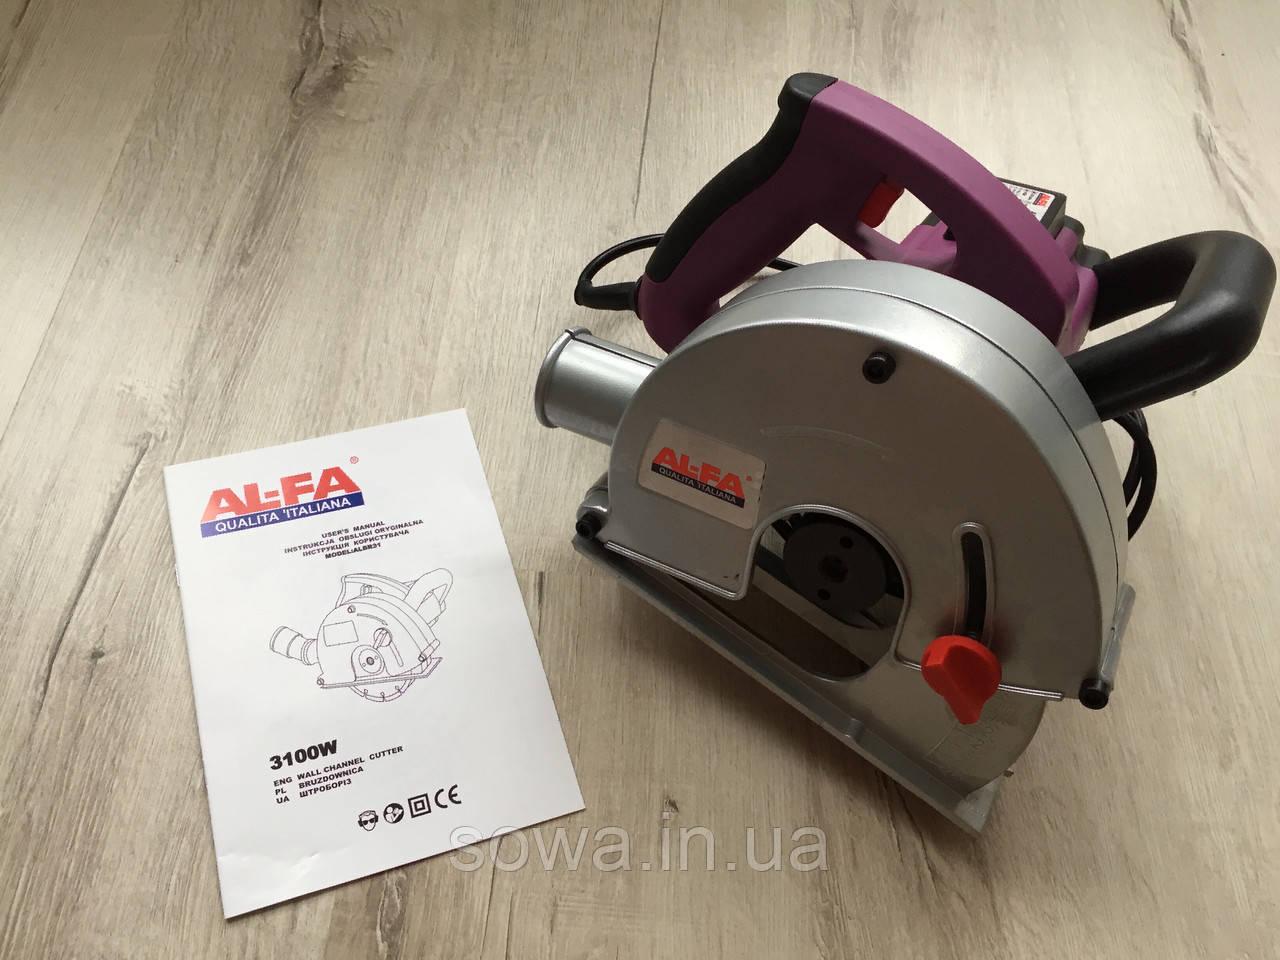 ✔️ Штроборез AL-FA 150-ALBR31    3100Вт, 4000об/мин